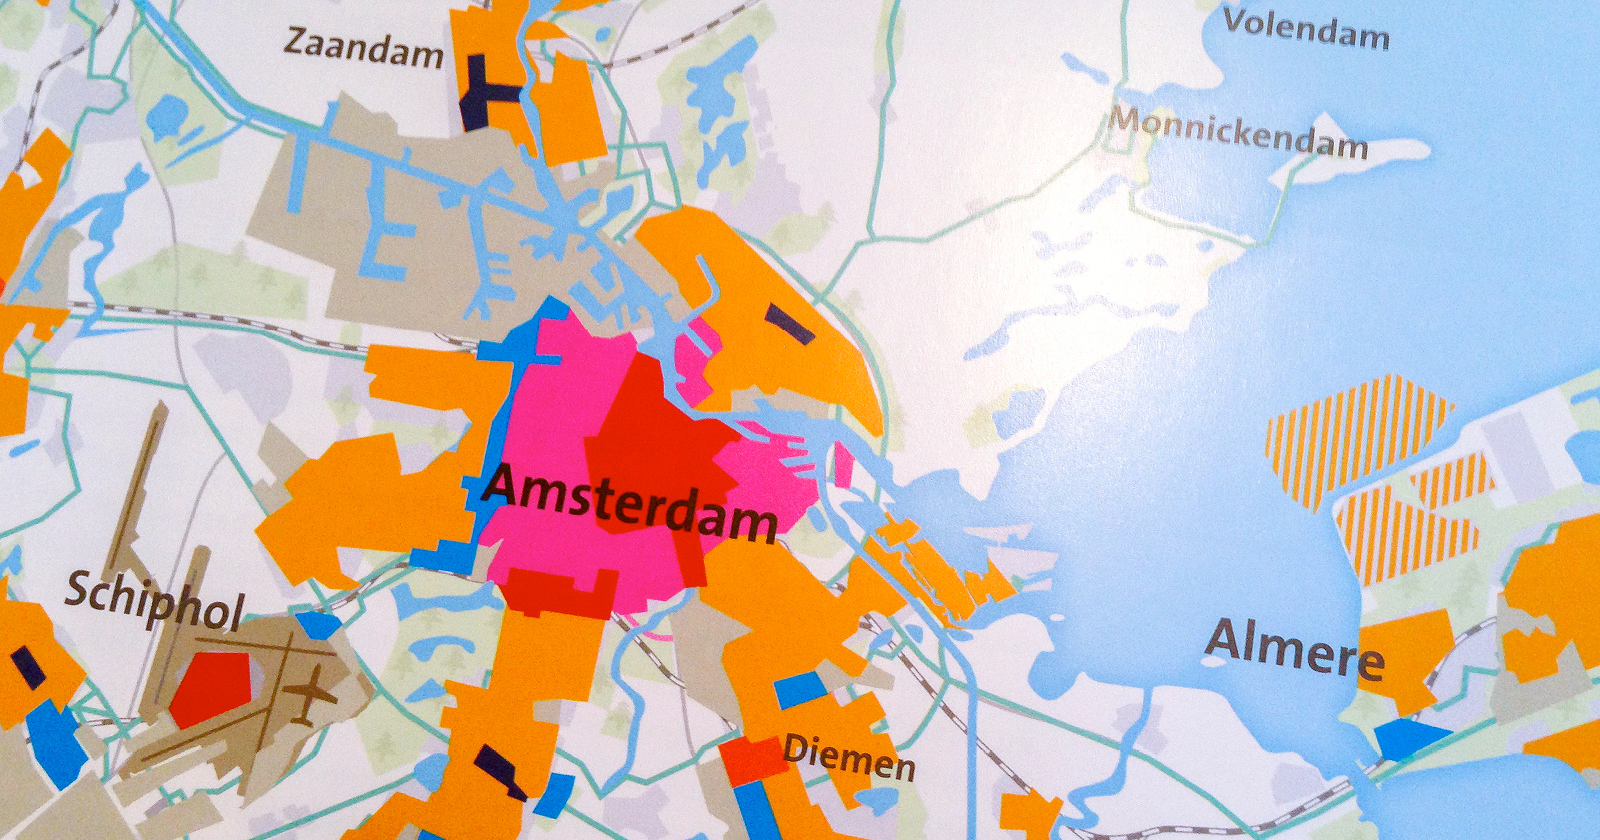 info-cartografics14-StadsregioAmsterdam